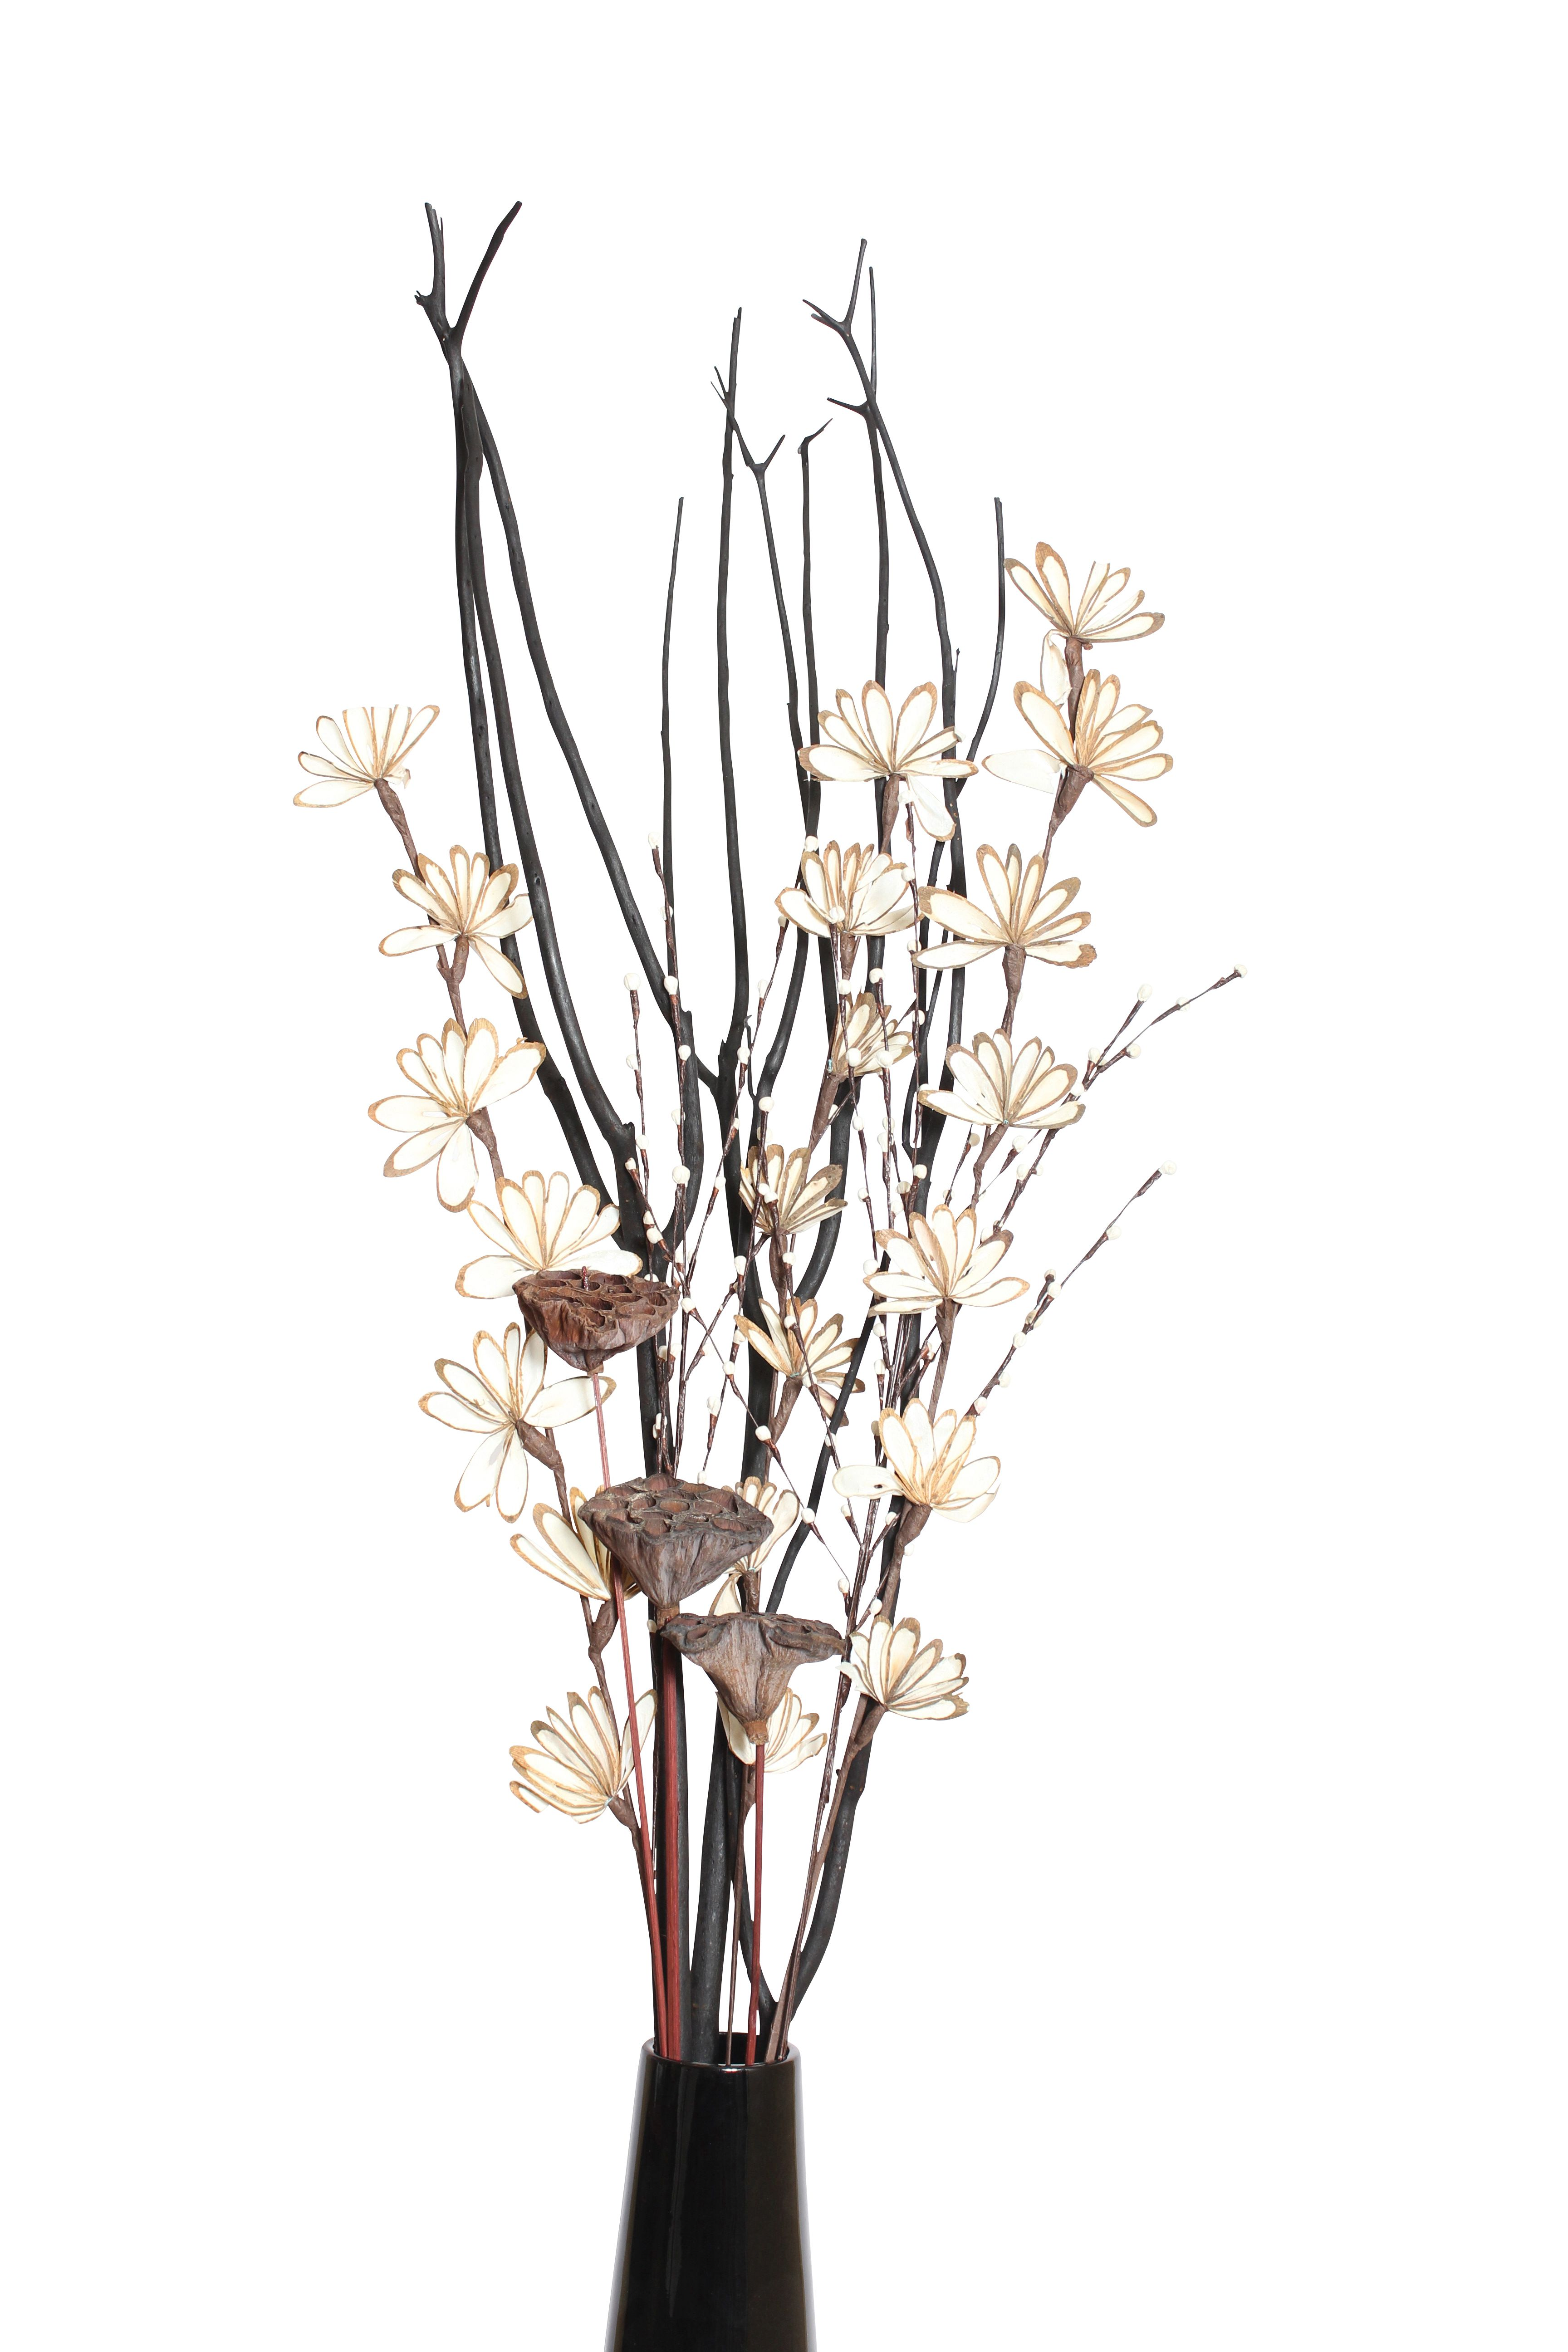 Floral Arrangement From Vyn Includes Black Mitsumata Balsa Sunburst Sola Bud Spray And Lotus Pods Visit Us At Www Vynflowers Com To Design Your Own Arrange